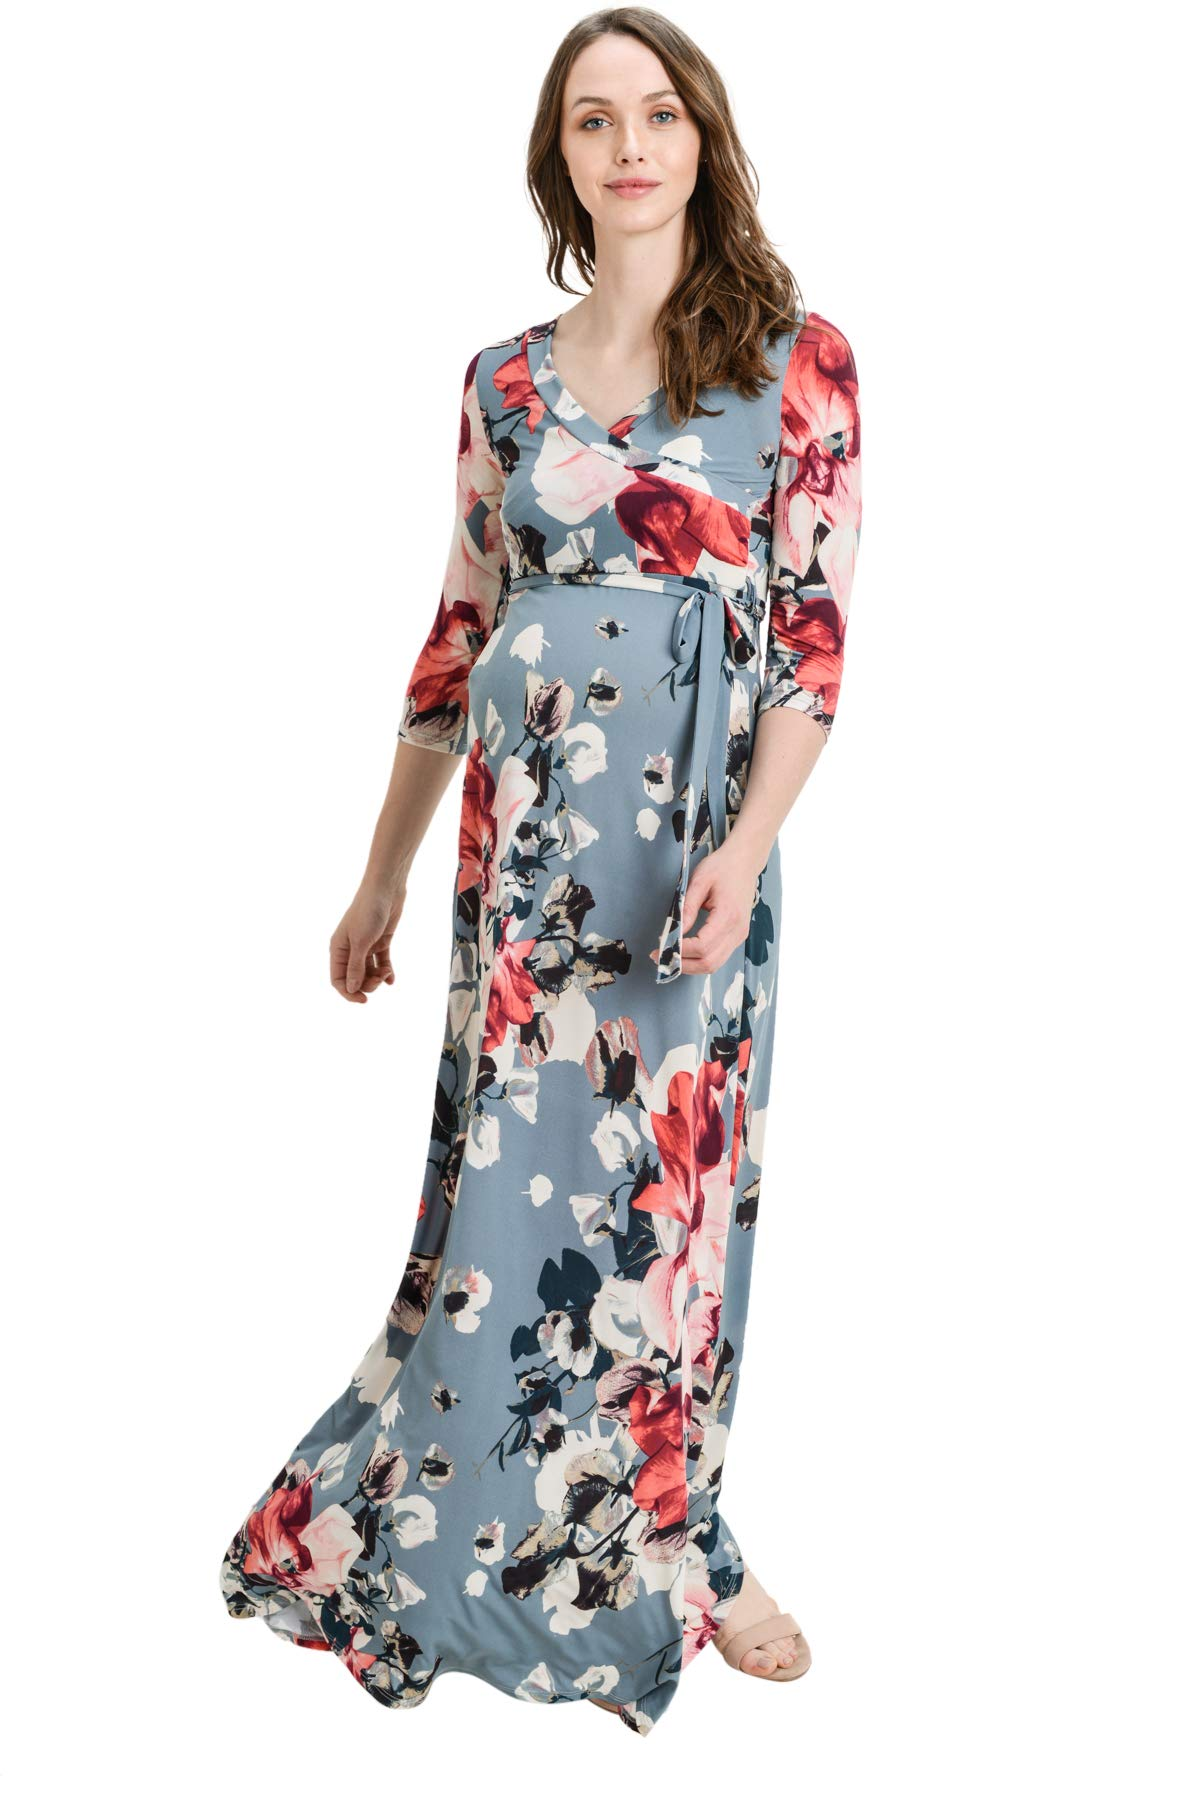 Hello MIZ Women's Floral Print Draped 3/4 Sleeve Long Maxi Maternity Dress (Chambray/Pink, L)